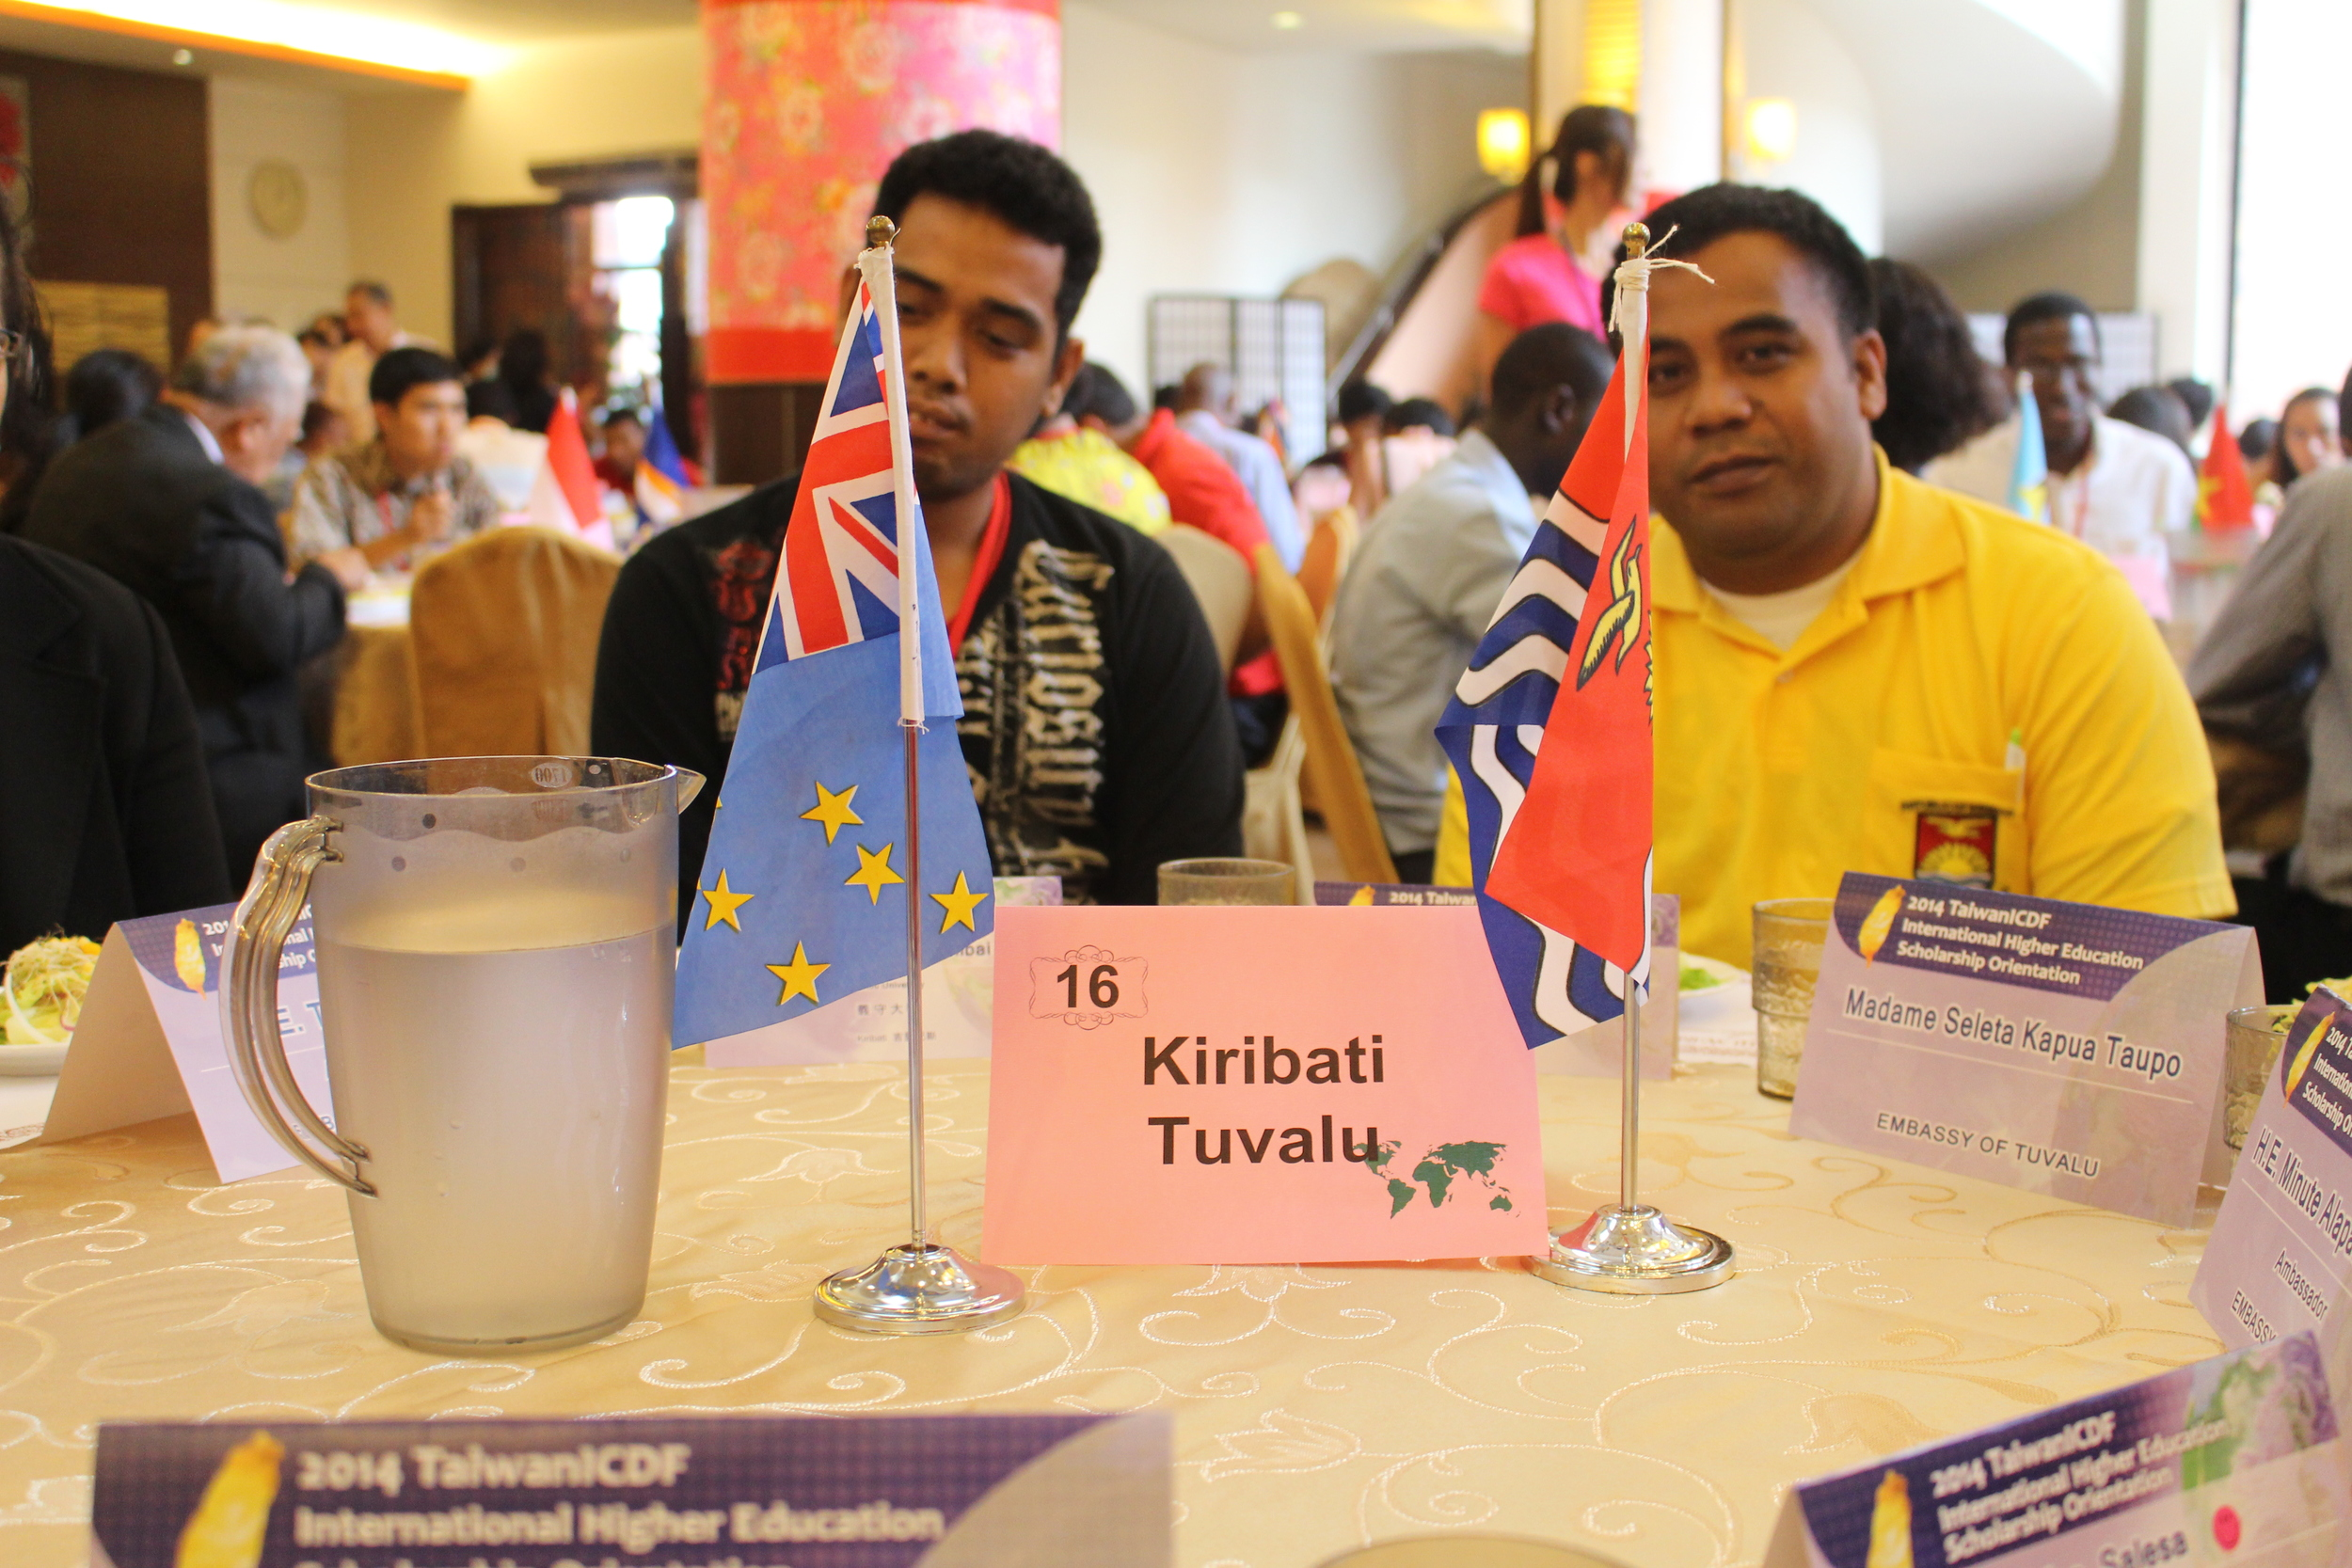 Students from Kiribati/來自吉里巴斯之學生